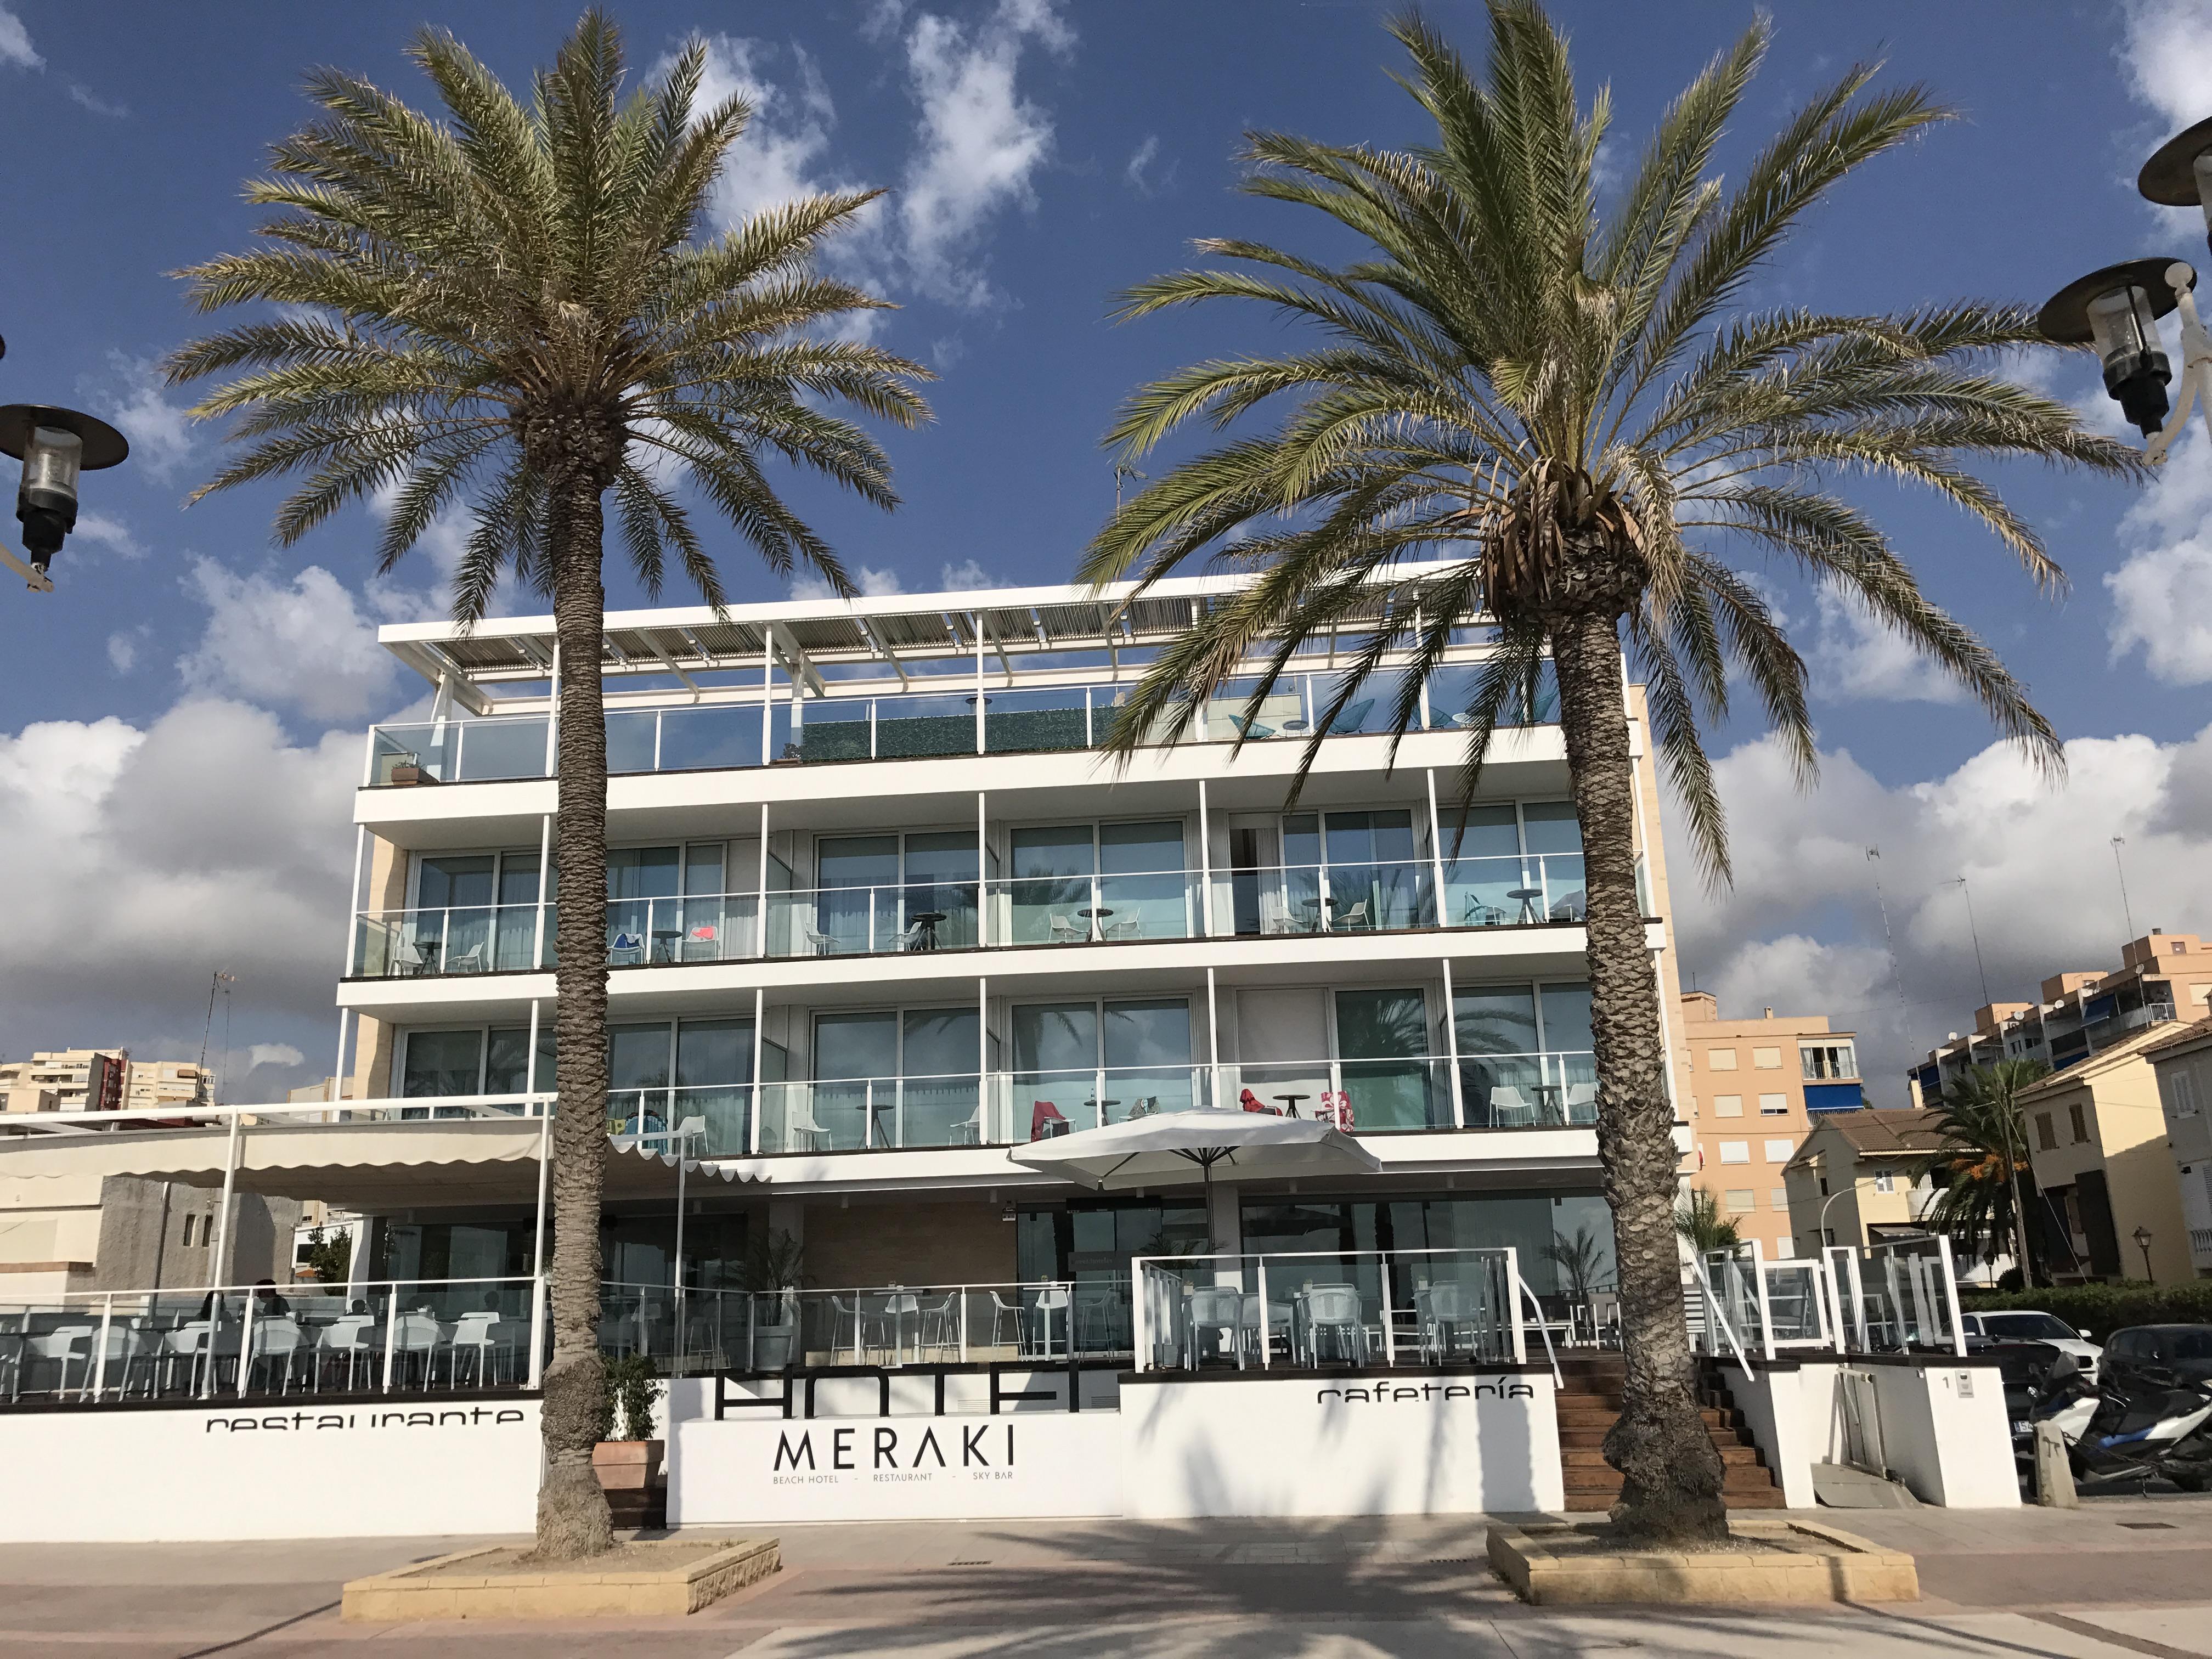 Meraki Beach Hotel, Valencia